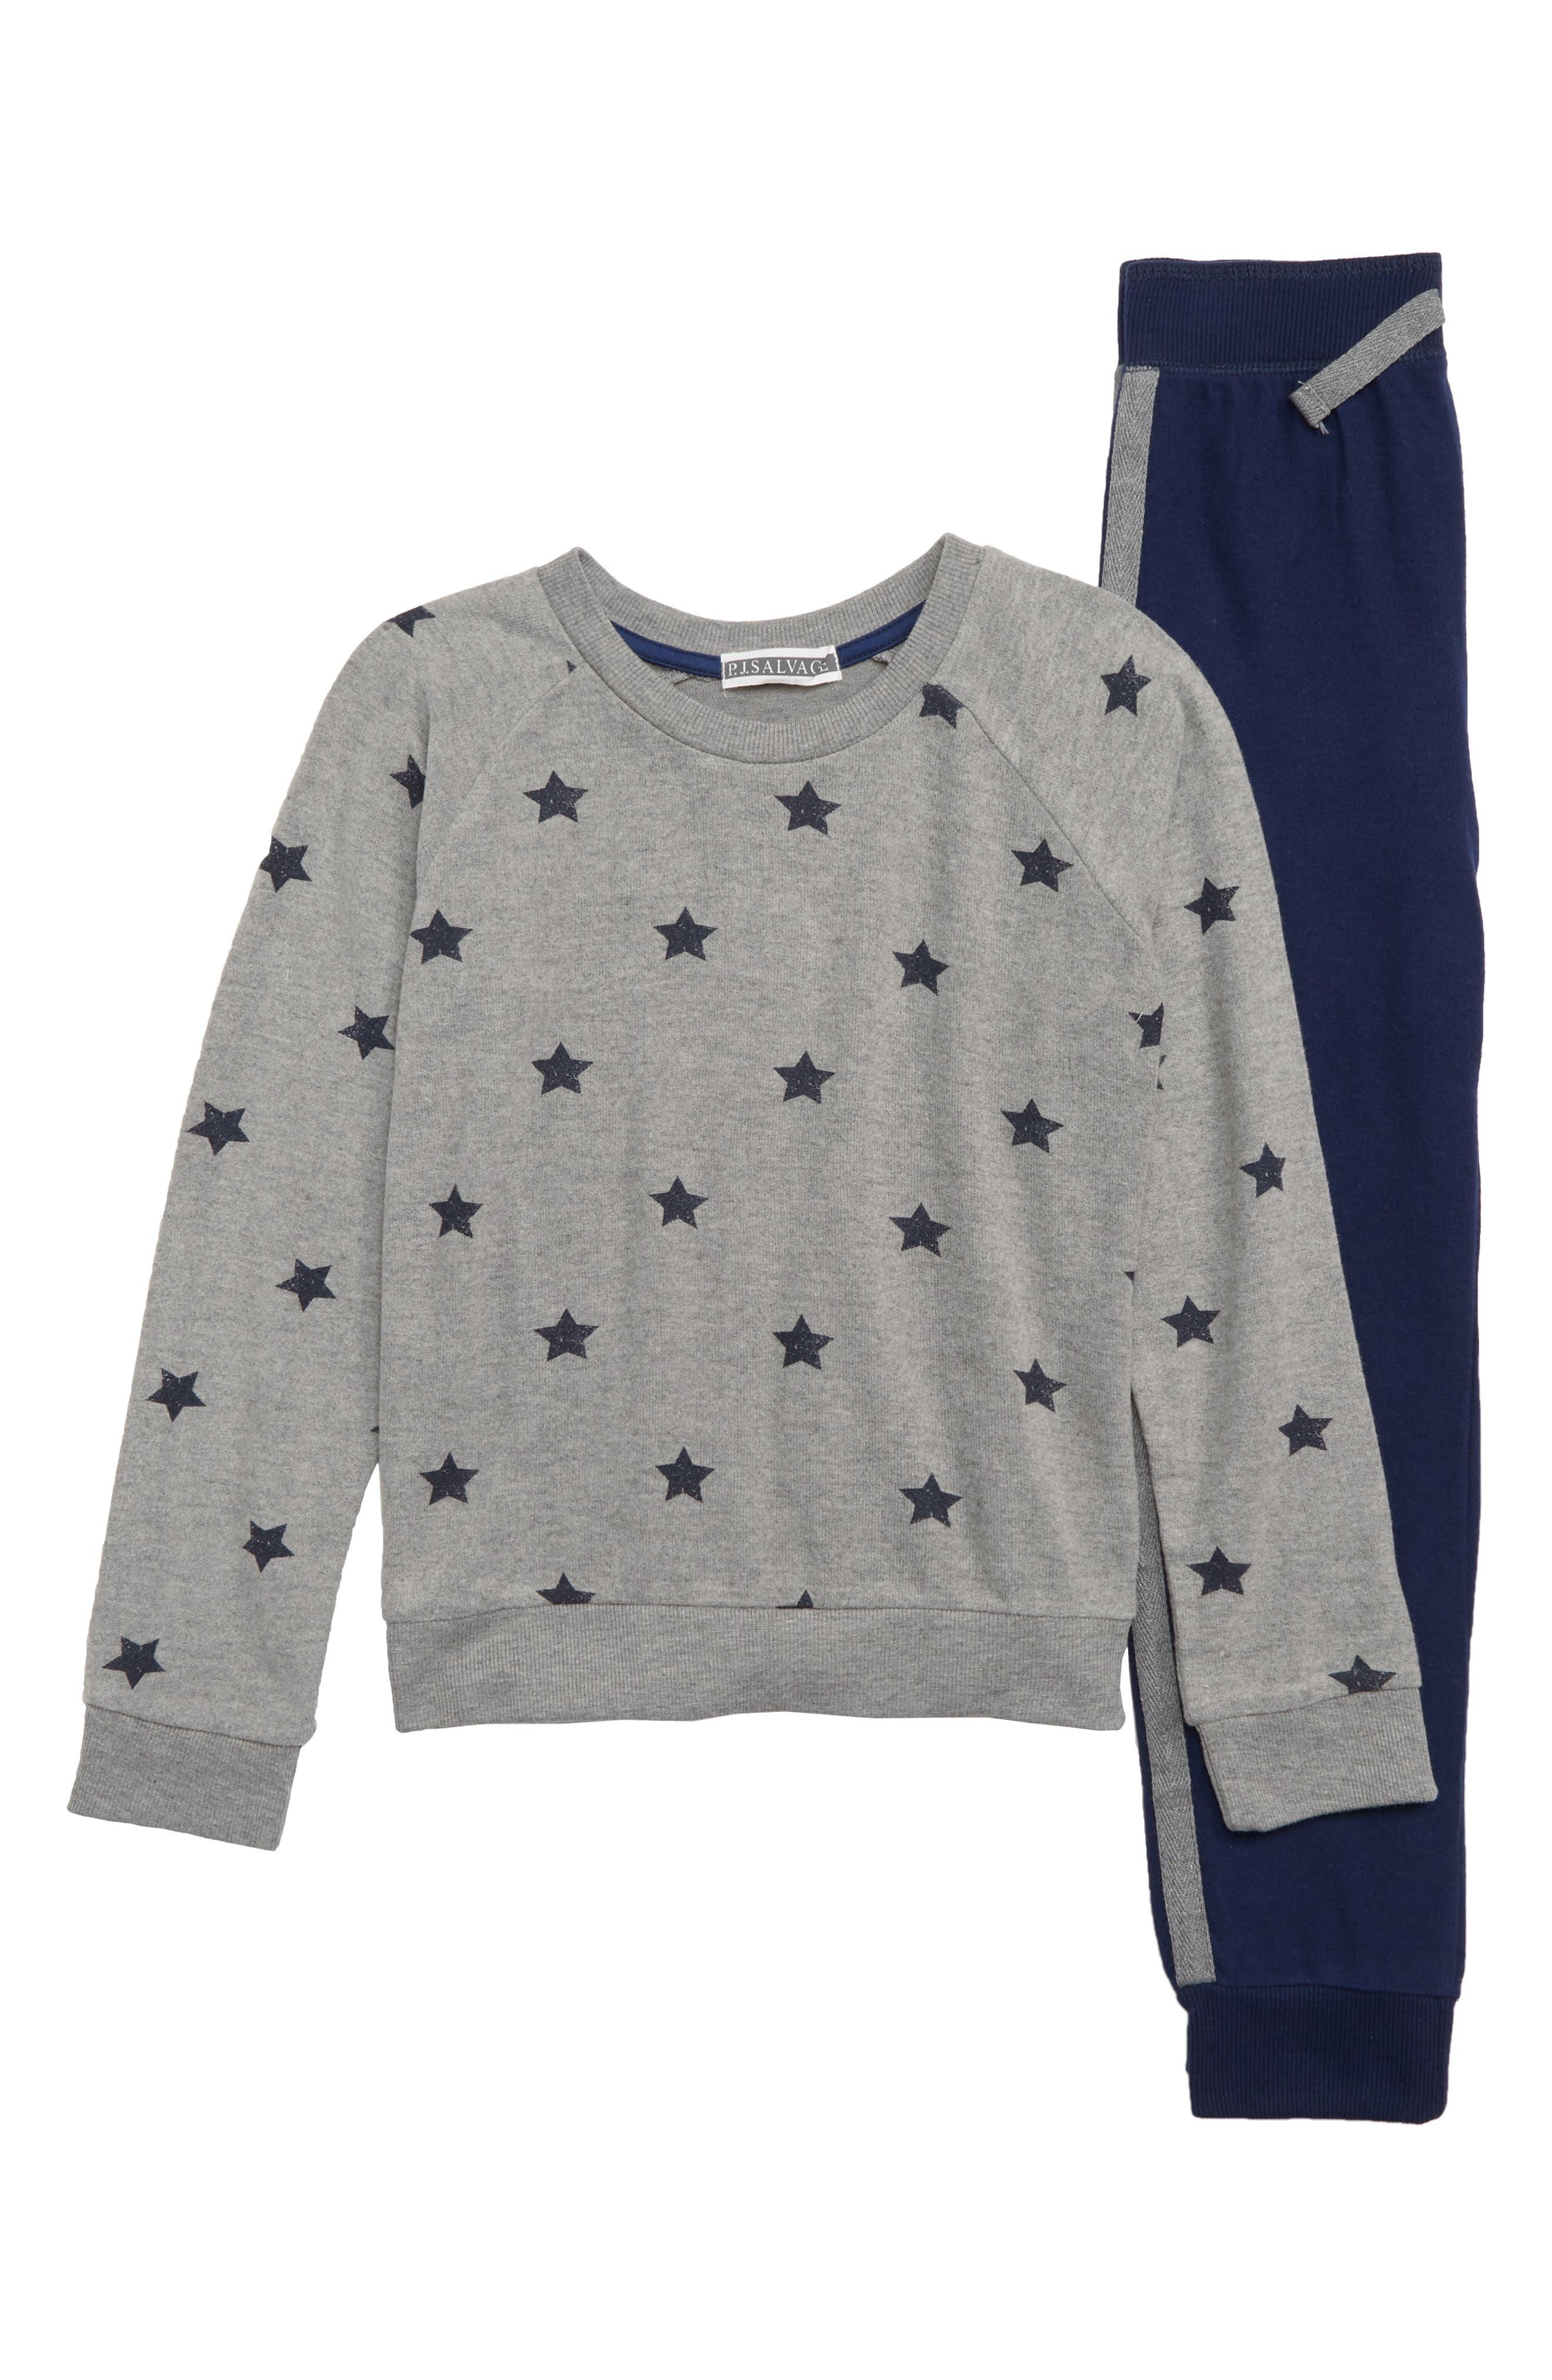 Super Star Two-Piece Pajamas,                             Main thumbnail 1, color,                             NAVY